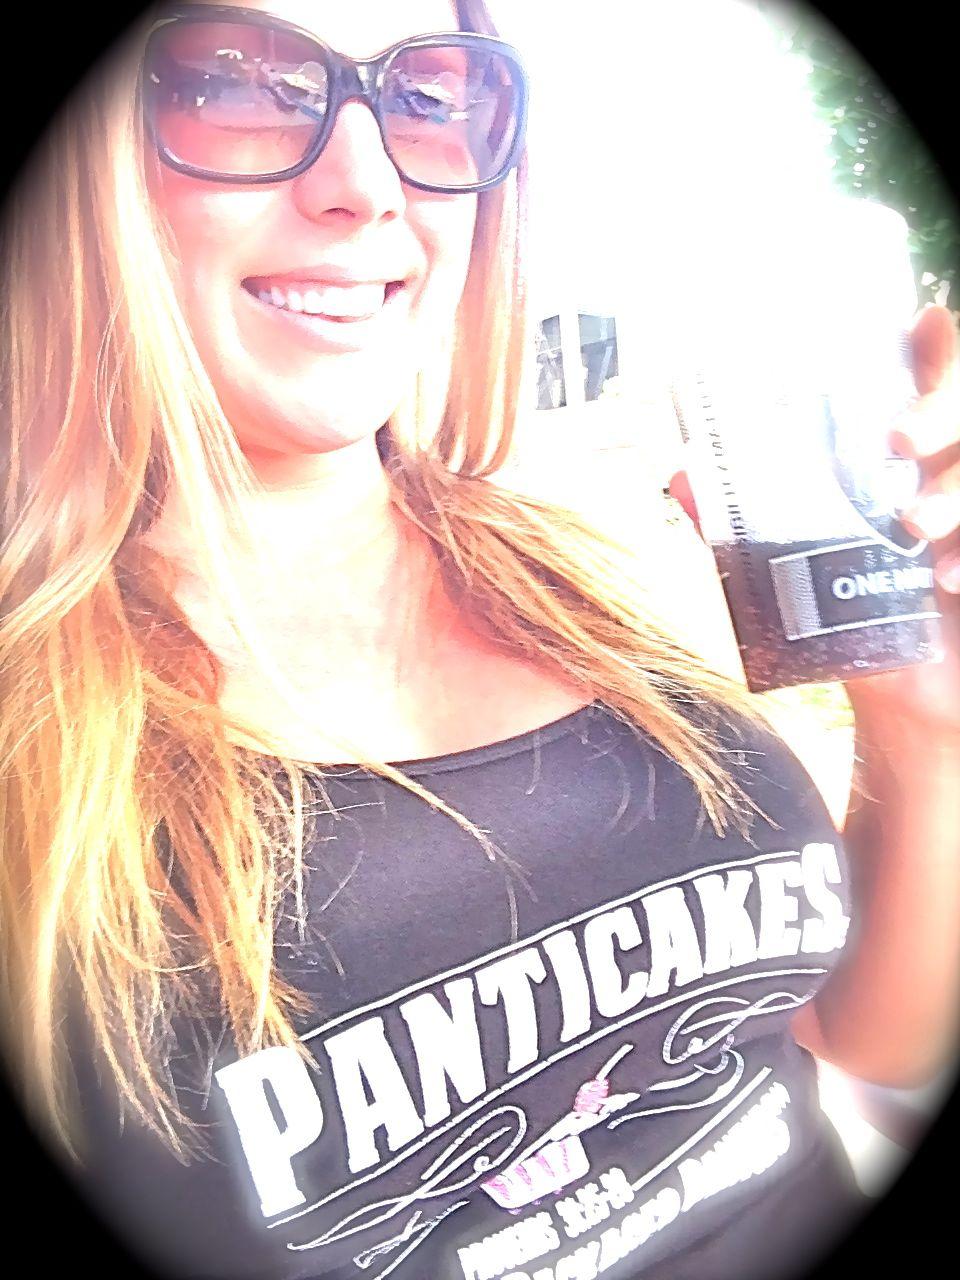 "Pin me! Panticakes Tank. Patent Pending Panticakes ""Prettiest Packaged Panties Panties wrapped to look like cupcakes delivered in frosting scented packaging WWW.panticakes.com Follow Panticakes on instagram www.facebook.com/panticakes1"